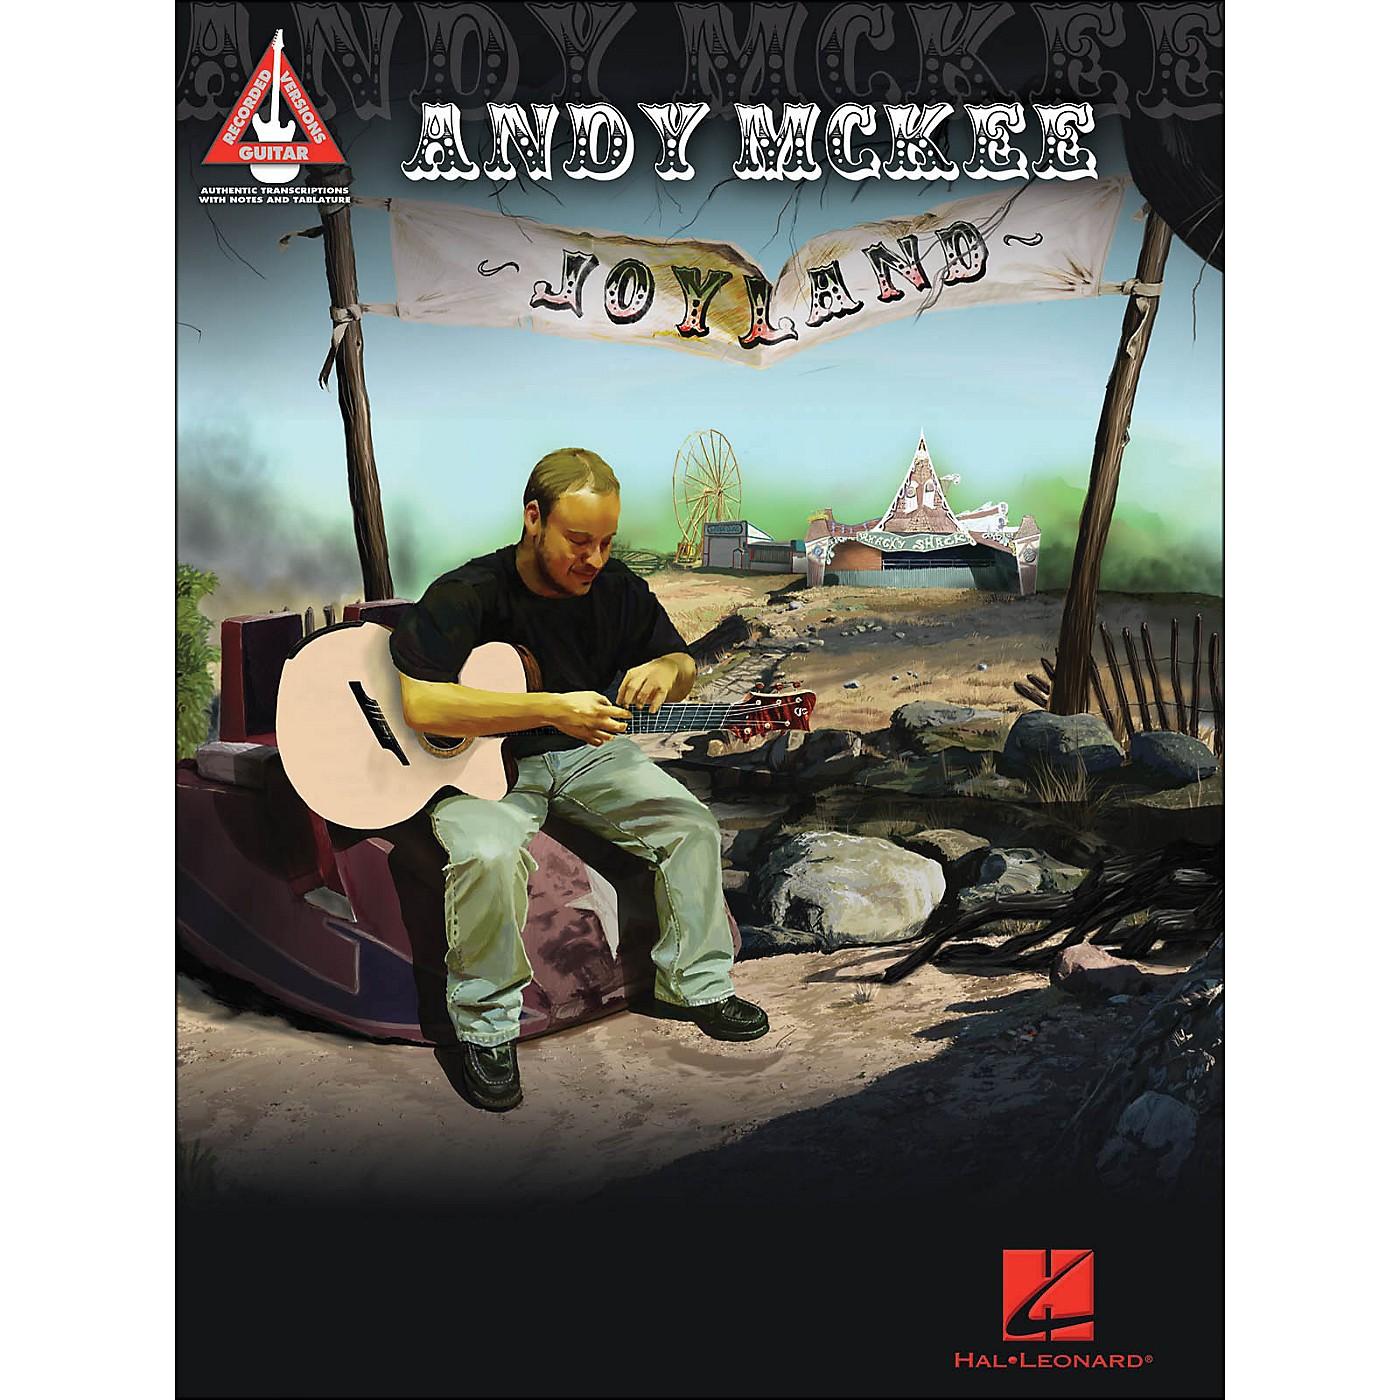 Hal Leonard Andy Mckee - Joyland Guitar Tab Songbook thumbnail